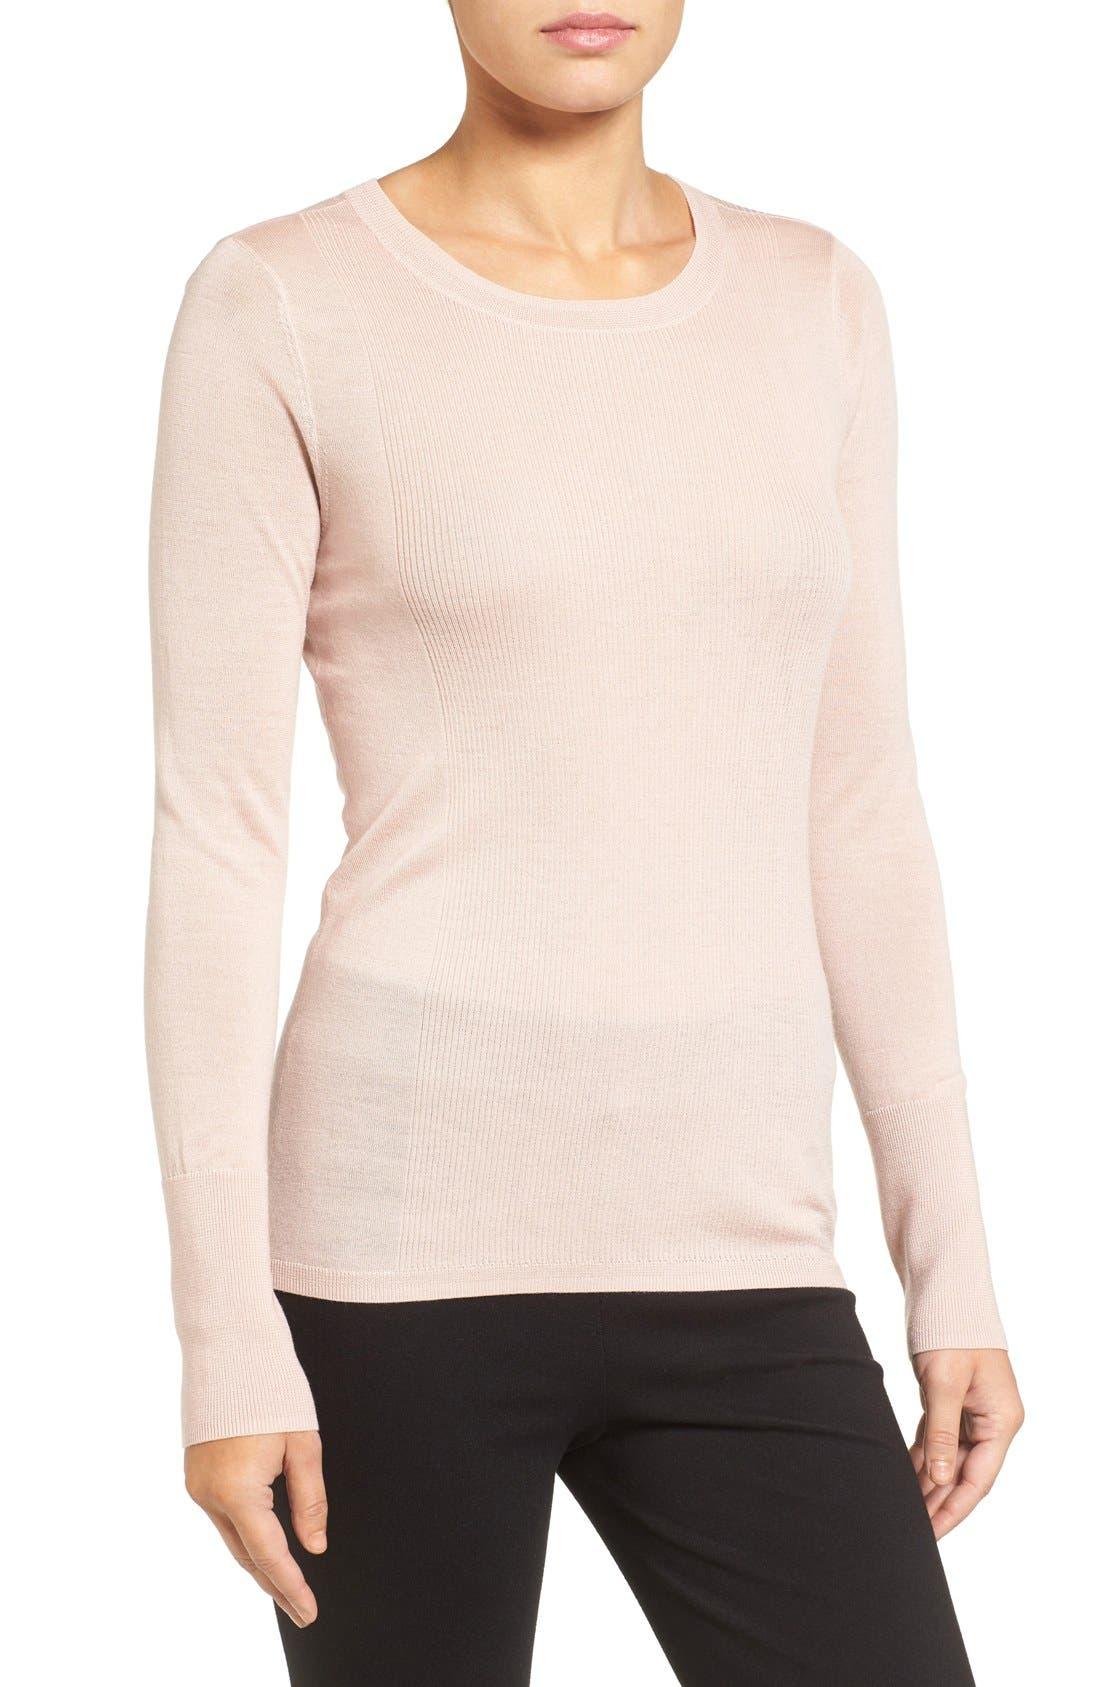 Alternate Image 1 Selected - Halogen® Rib Detail Lightweight Merino Wool Sweater (Regular & Petite)